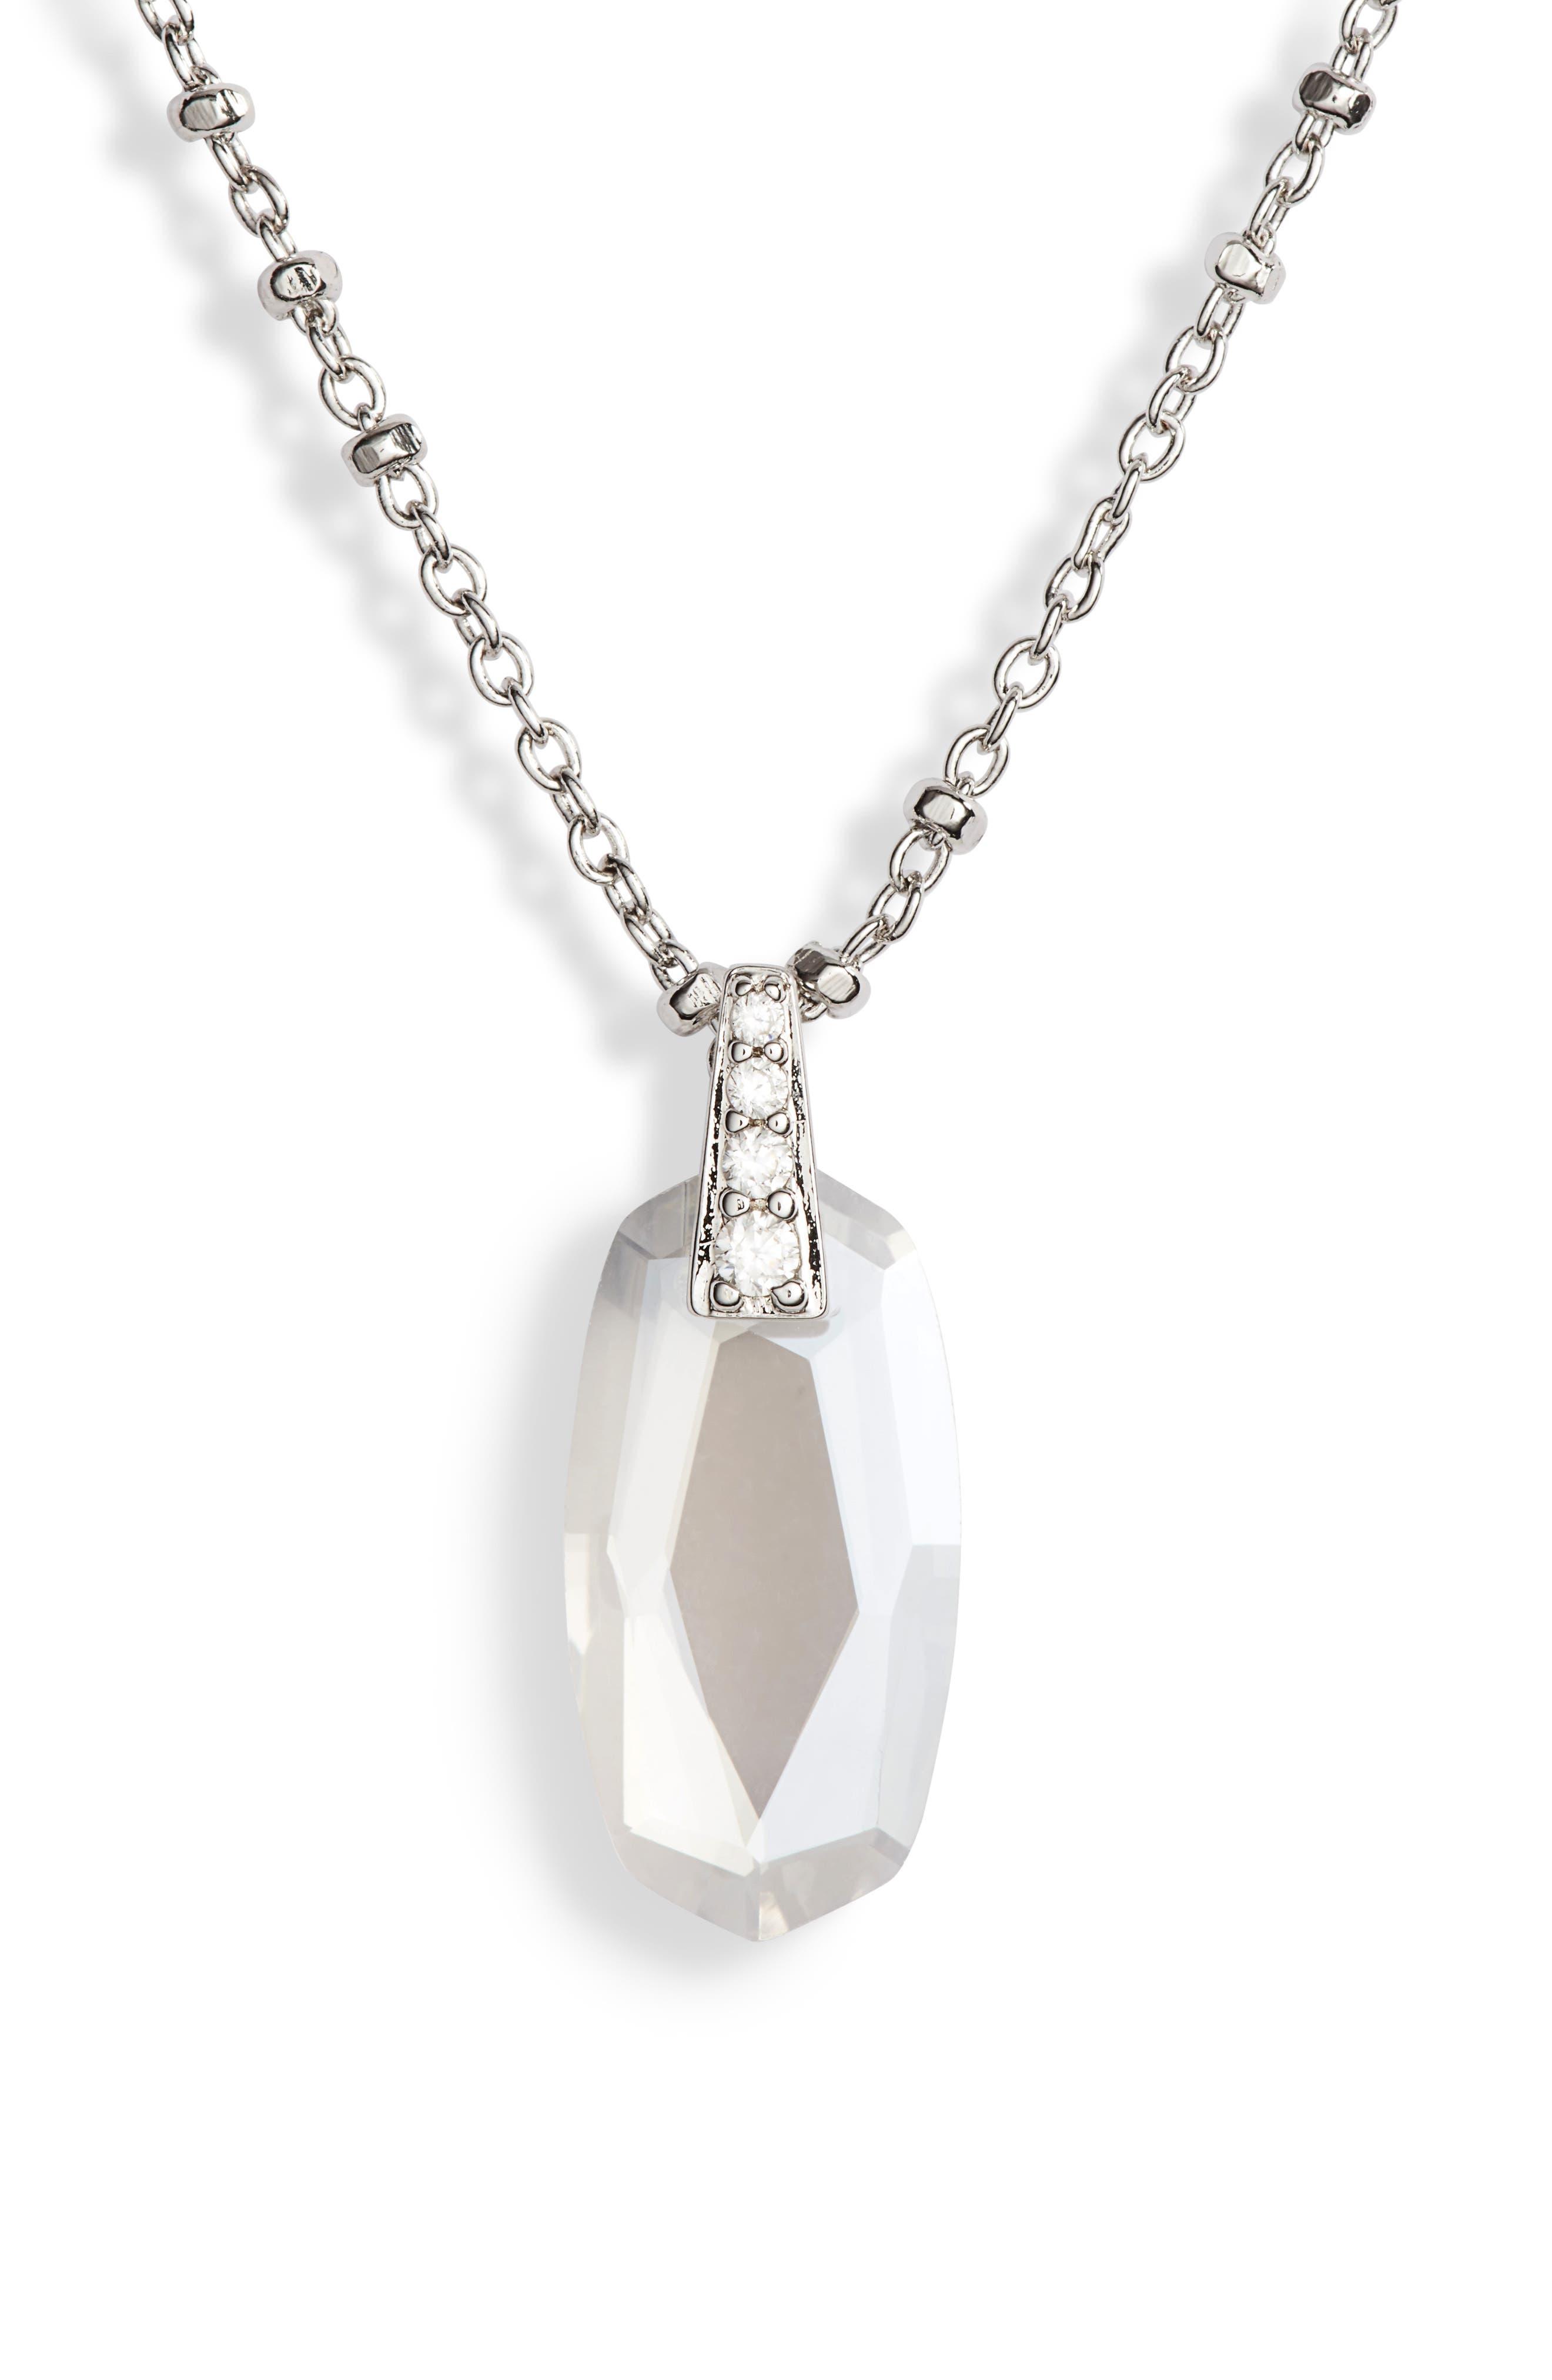 KENDRA SCOTT, Camila Pendant Necklace, Main thumbnail 1, color, LUSTRE GLASSS/ SILVER